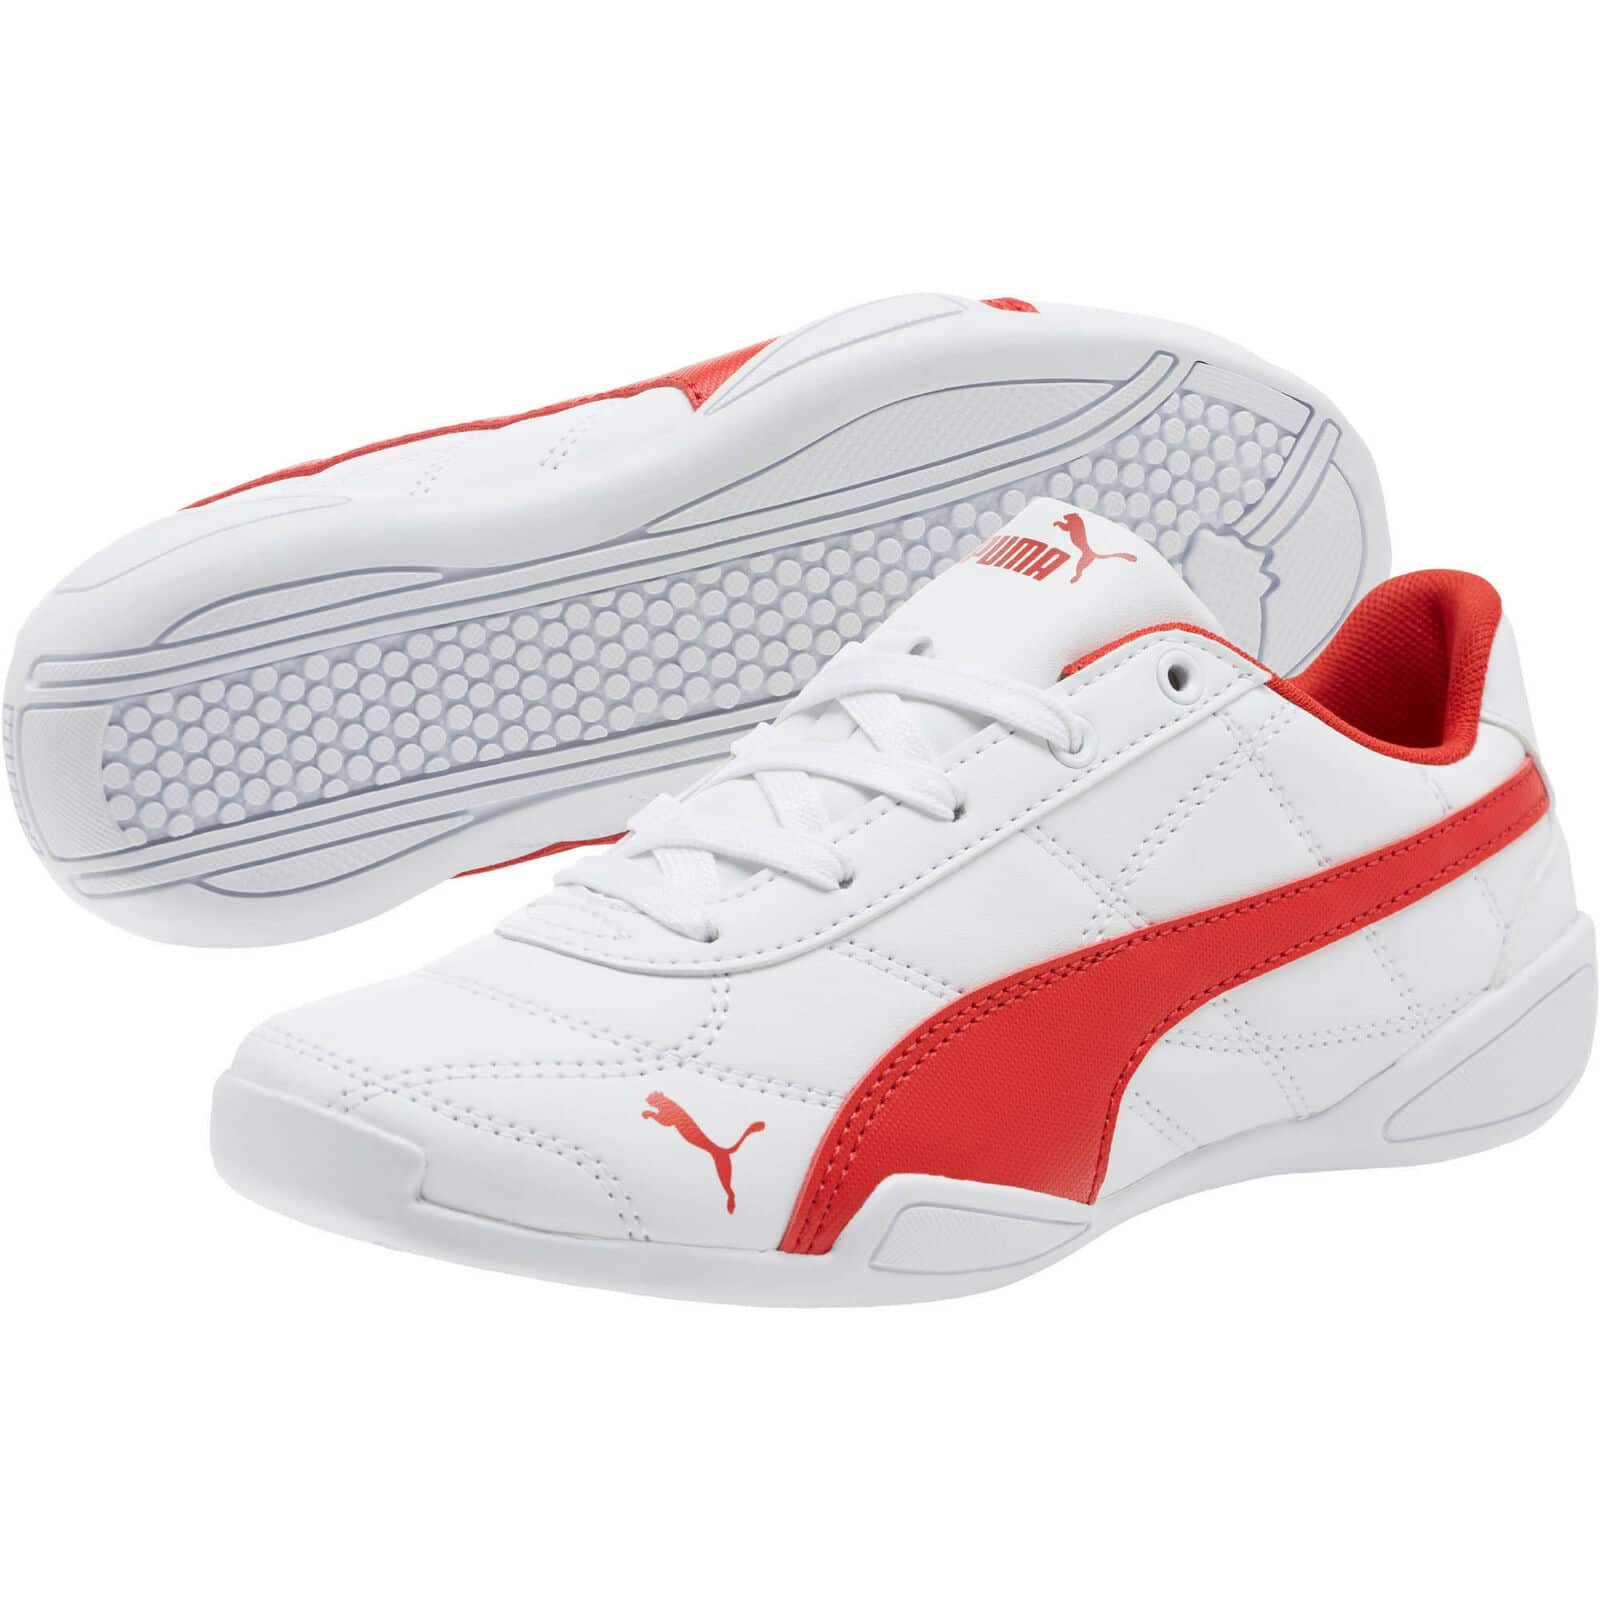 PUMA Little Kids' Tune Cat 3 Shoe (White 3) $17 + Free Shipping